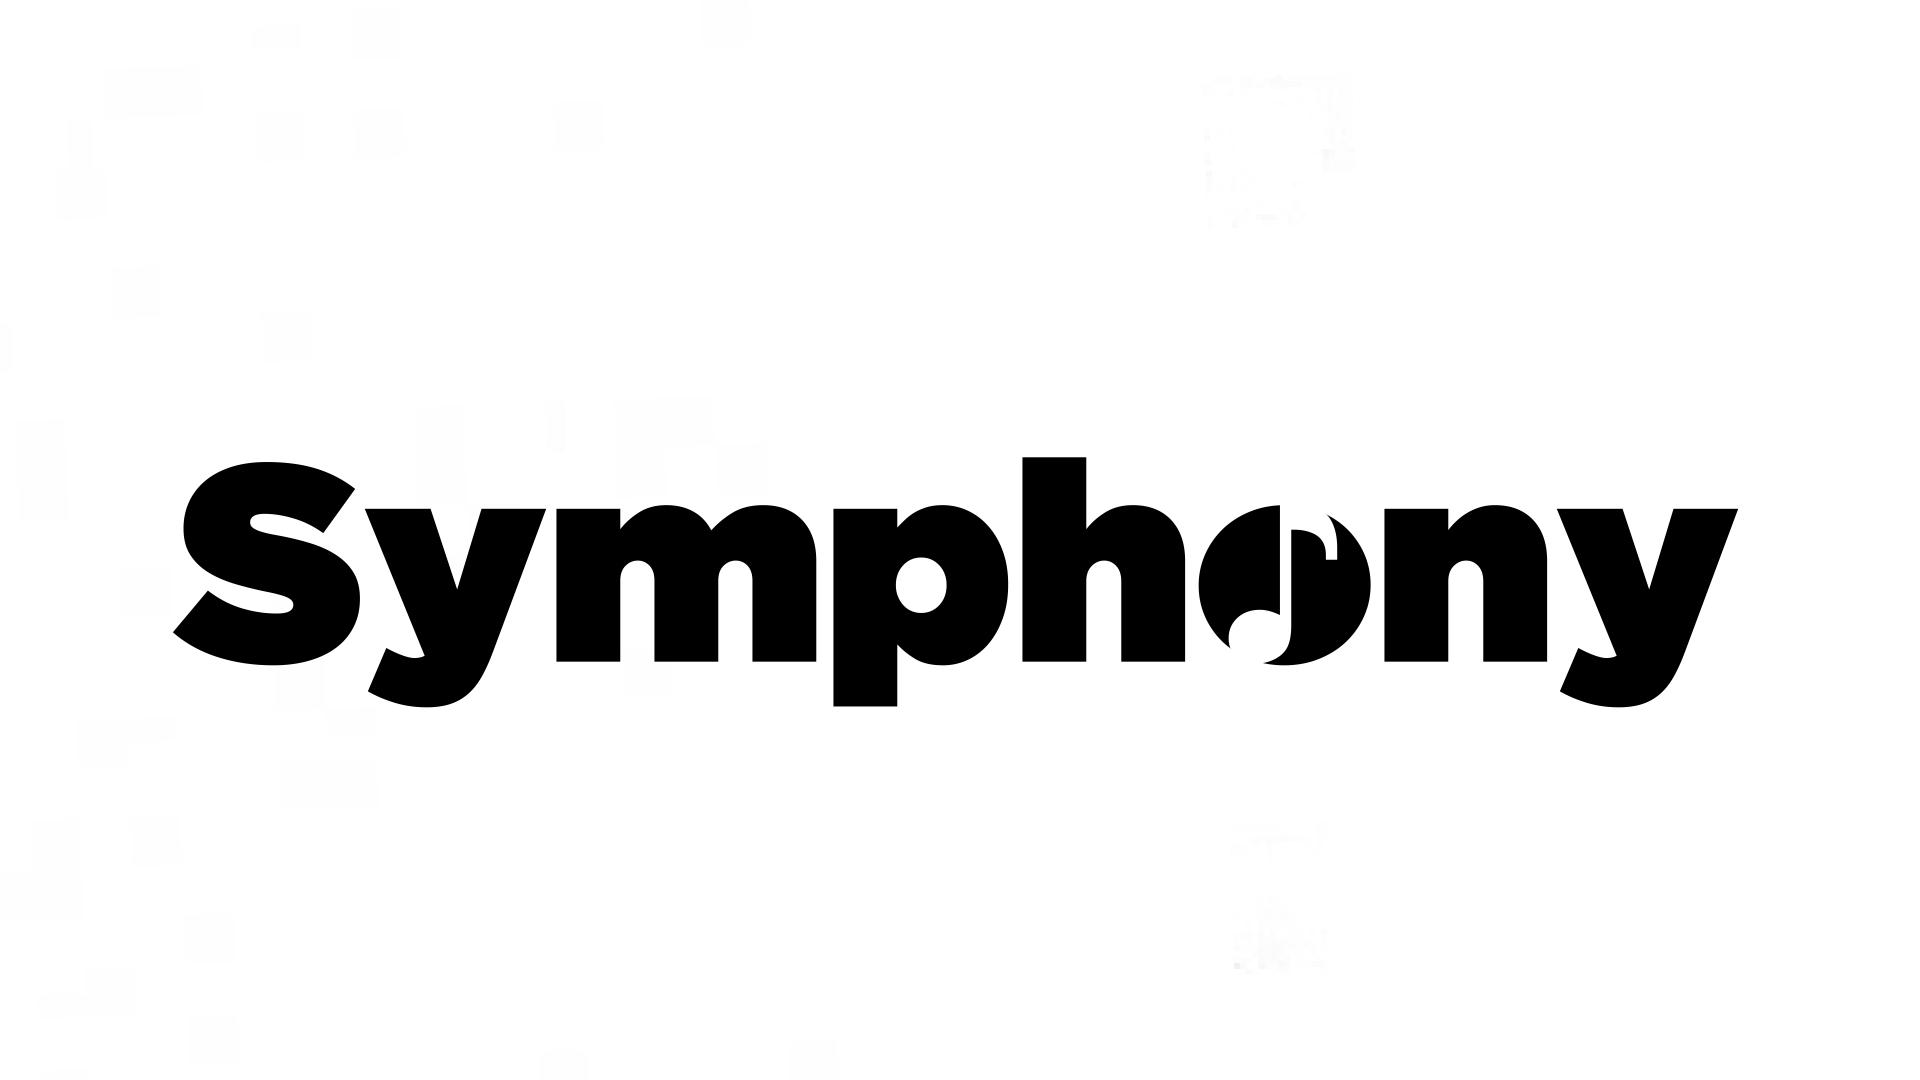 PNG Symphony - 56894